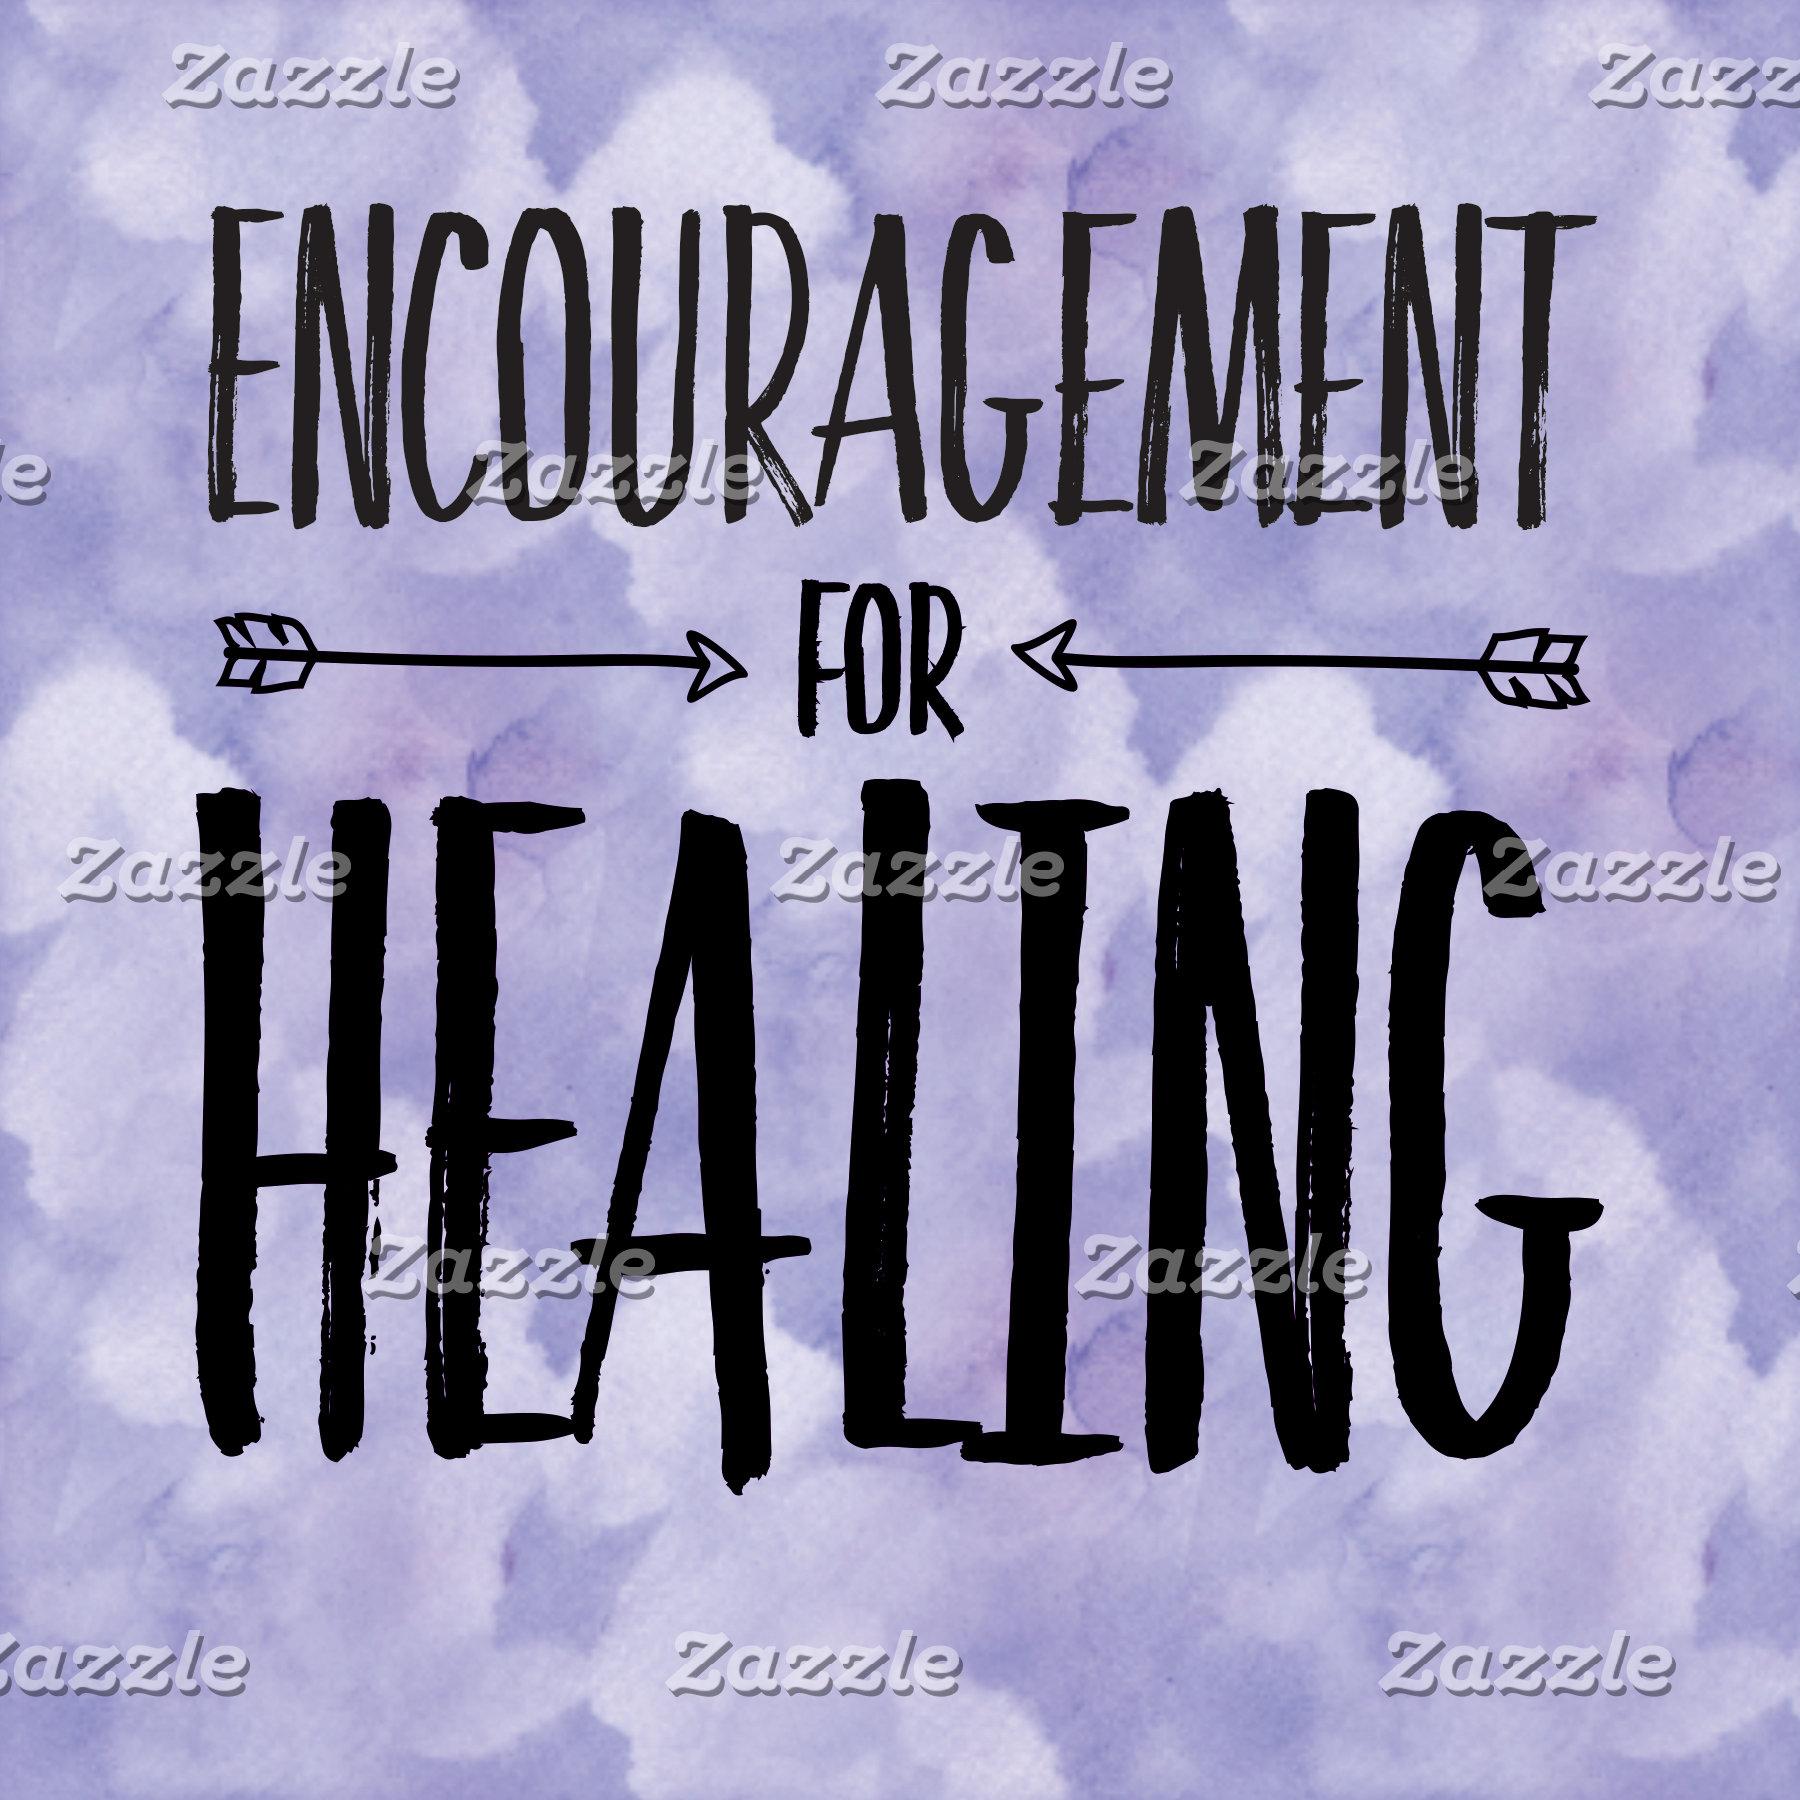 Encouragement for Healing